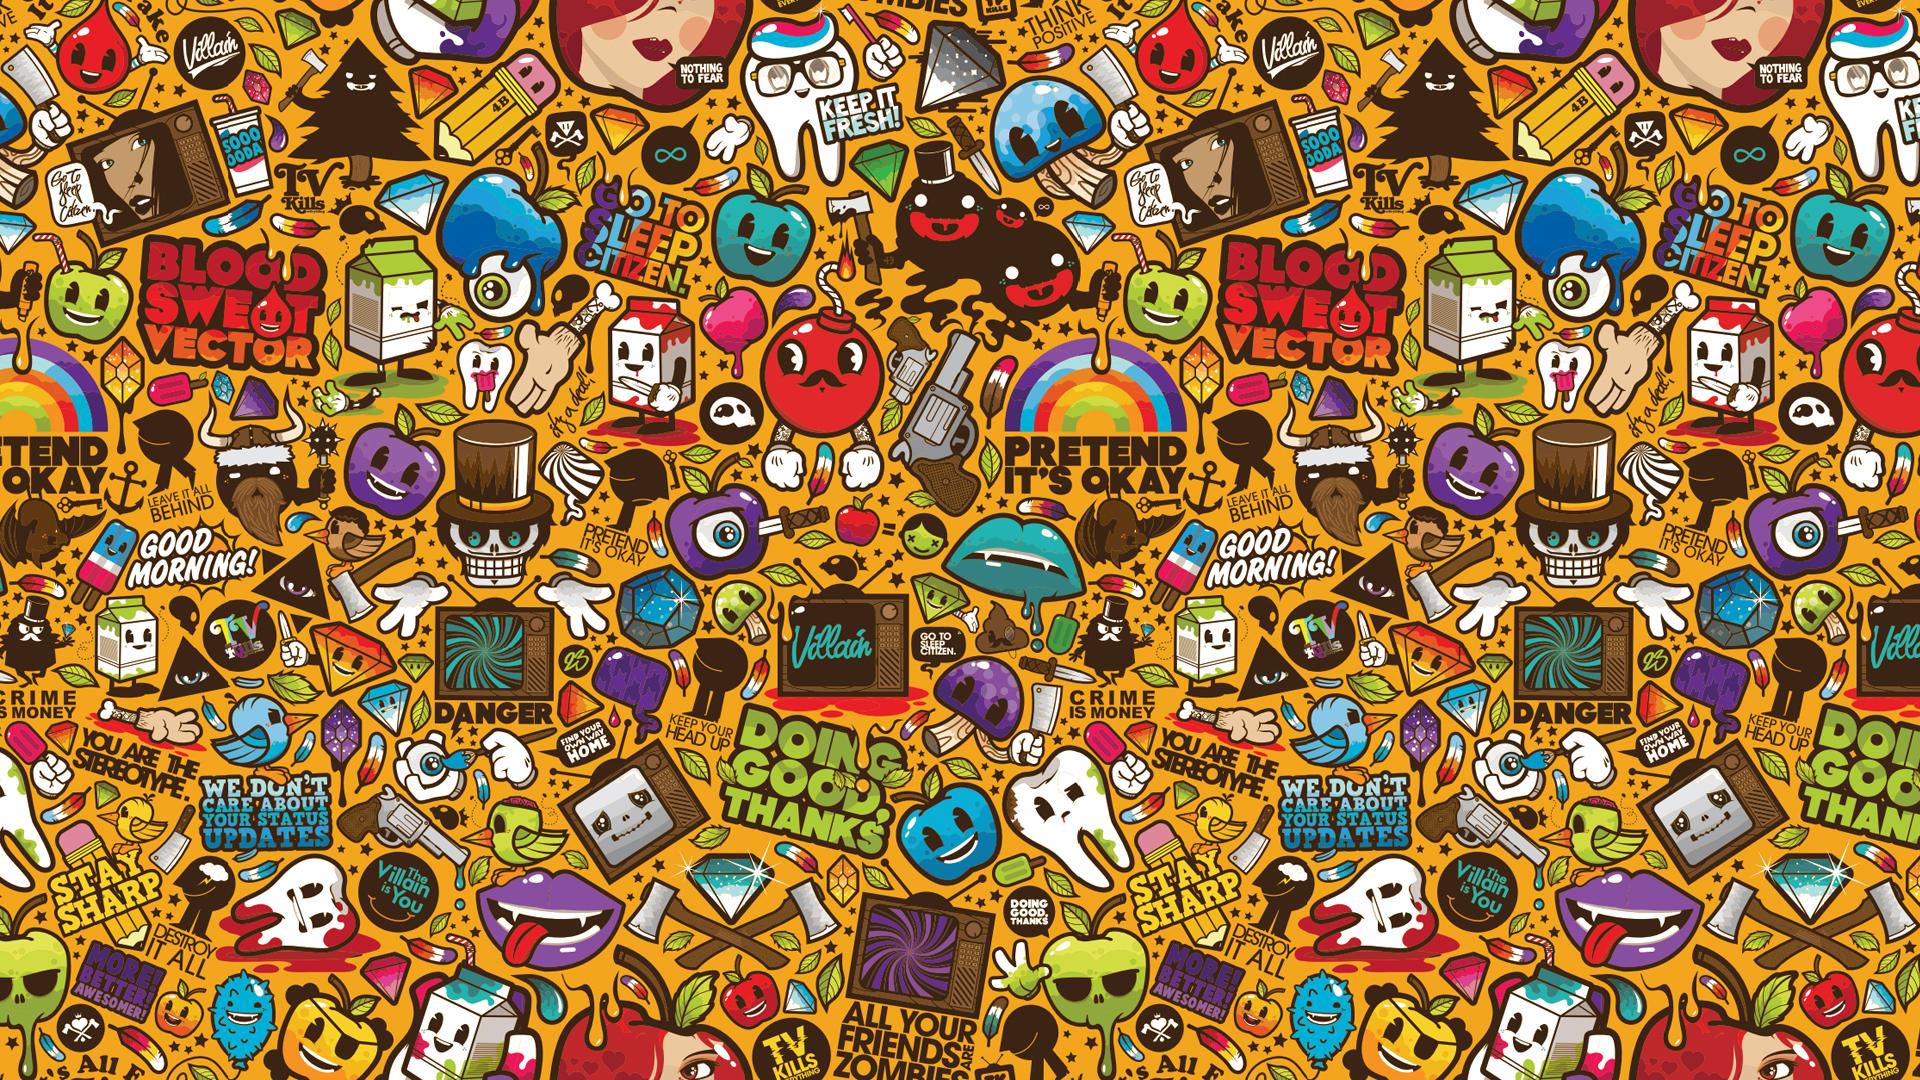 Sticker bomb hd wallpaper background image 1920x1080 id690862 wallpaper abyss